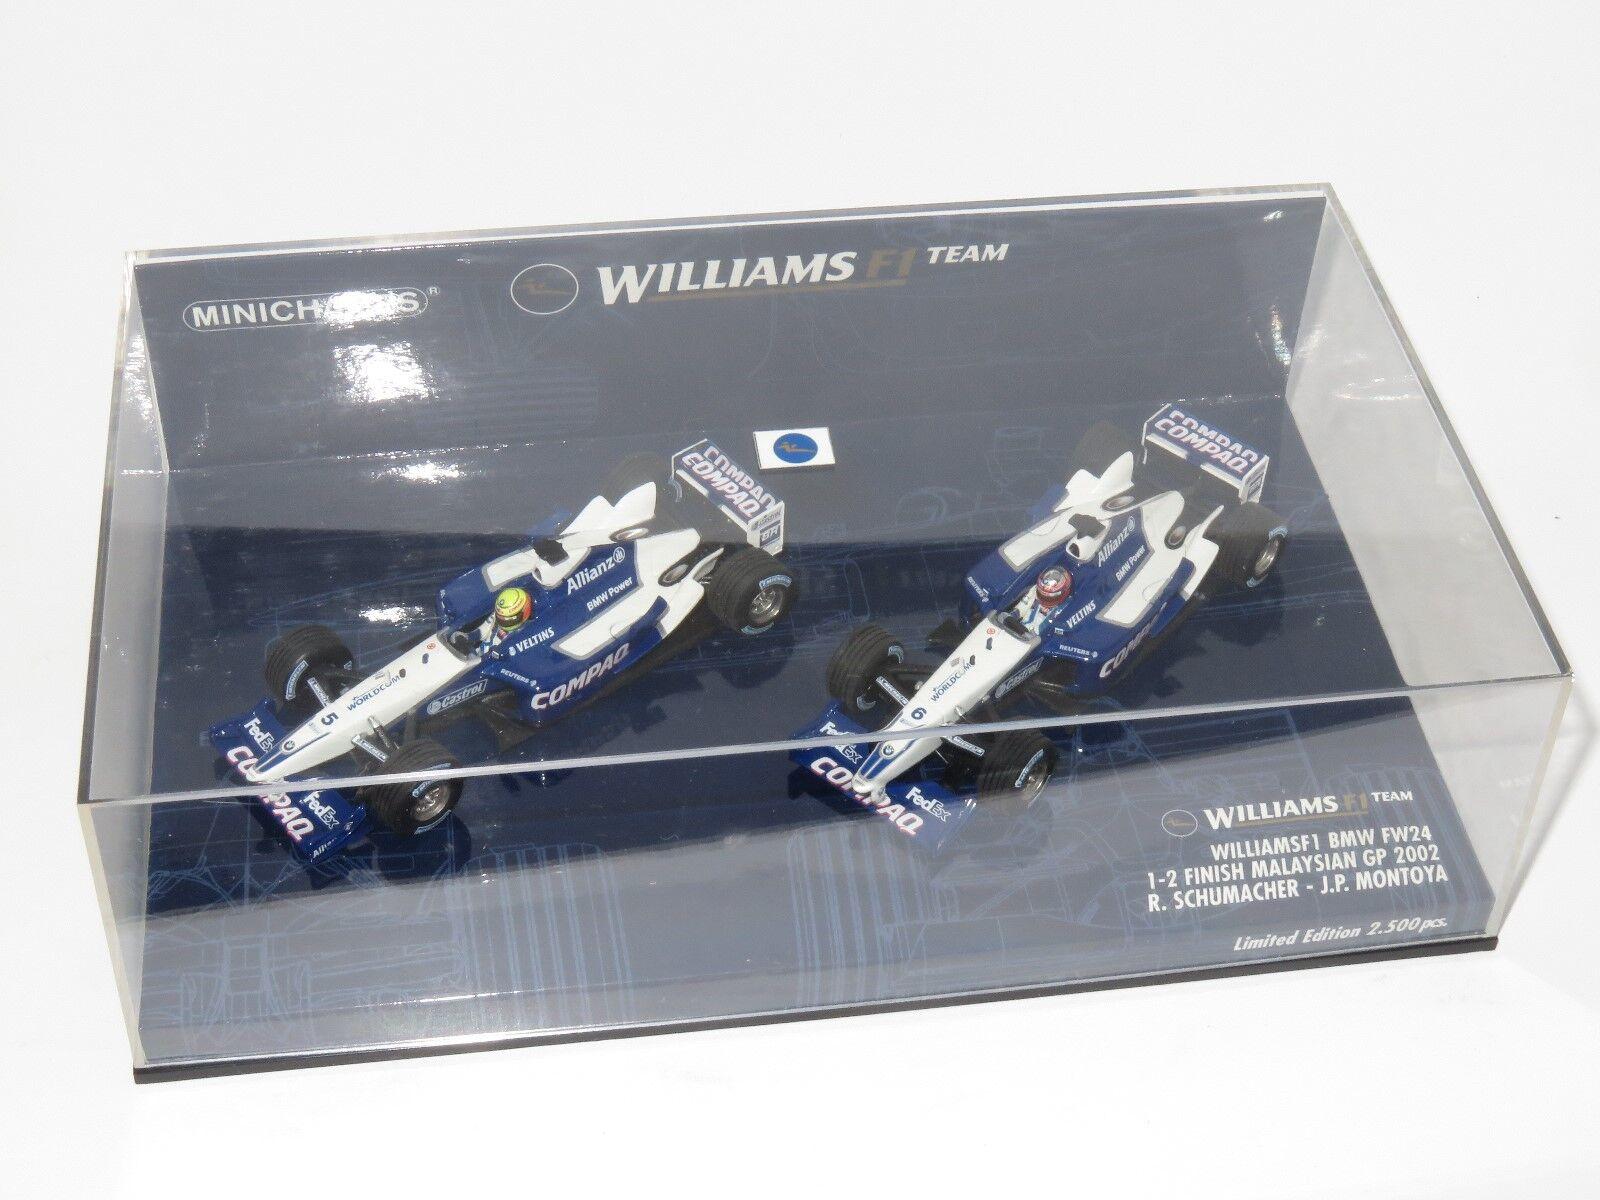 WILLIAMS BMW FW24 Malaysian GP Ensemble limité R. Schumacher & J. Montoya 1st & 2nd